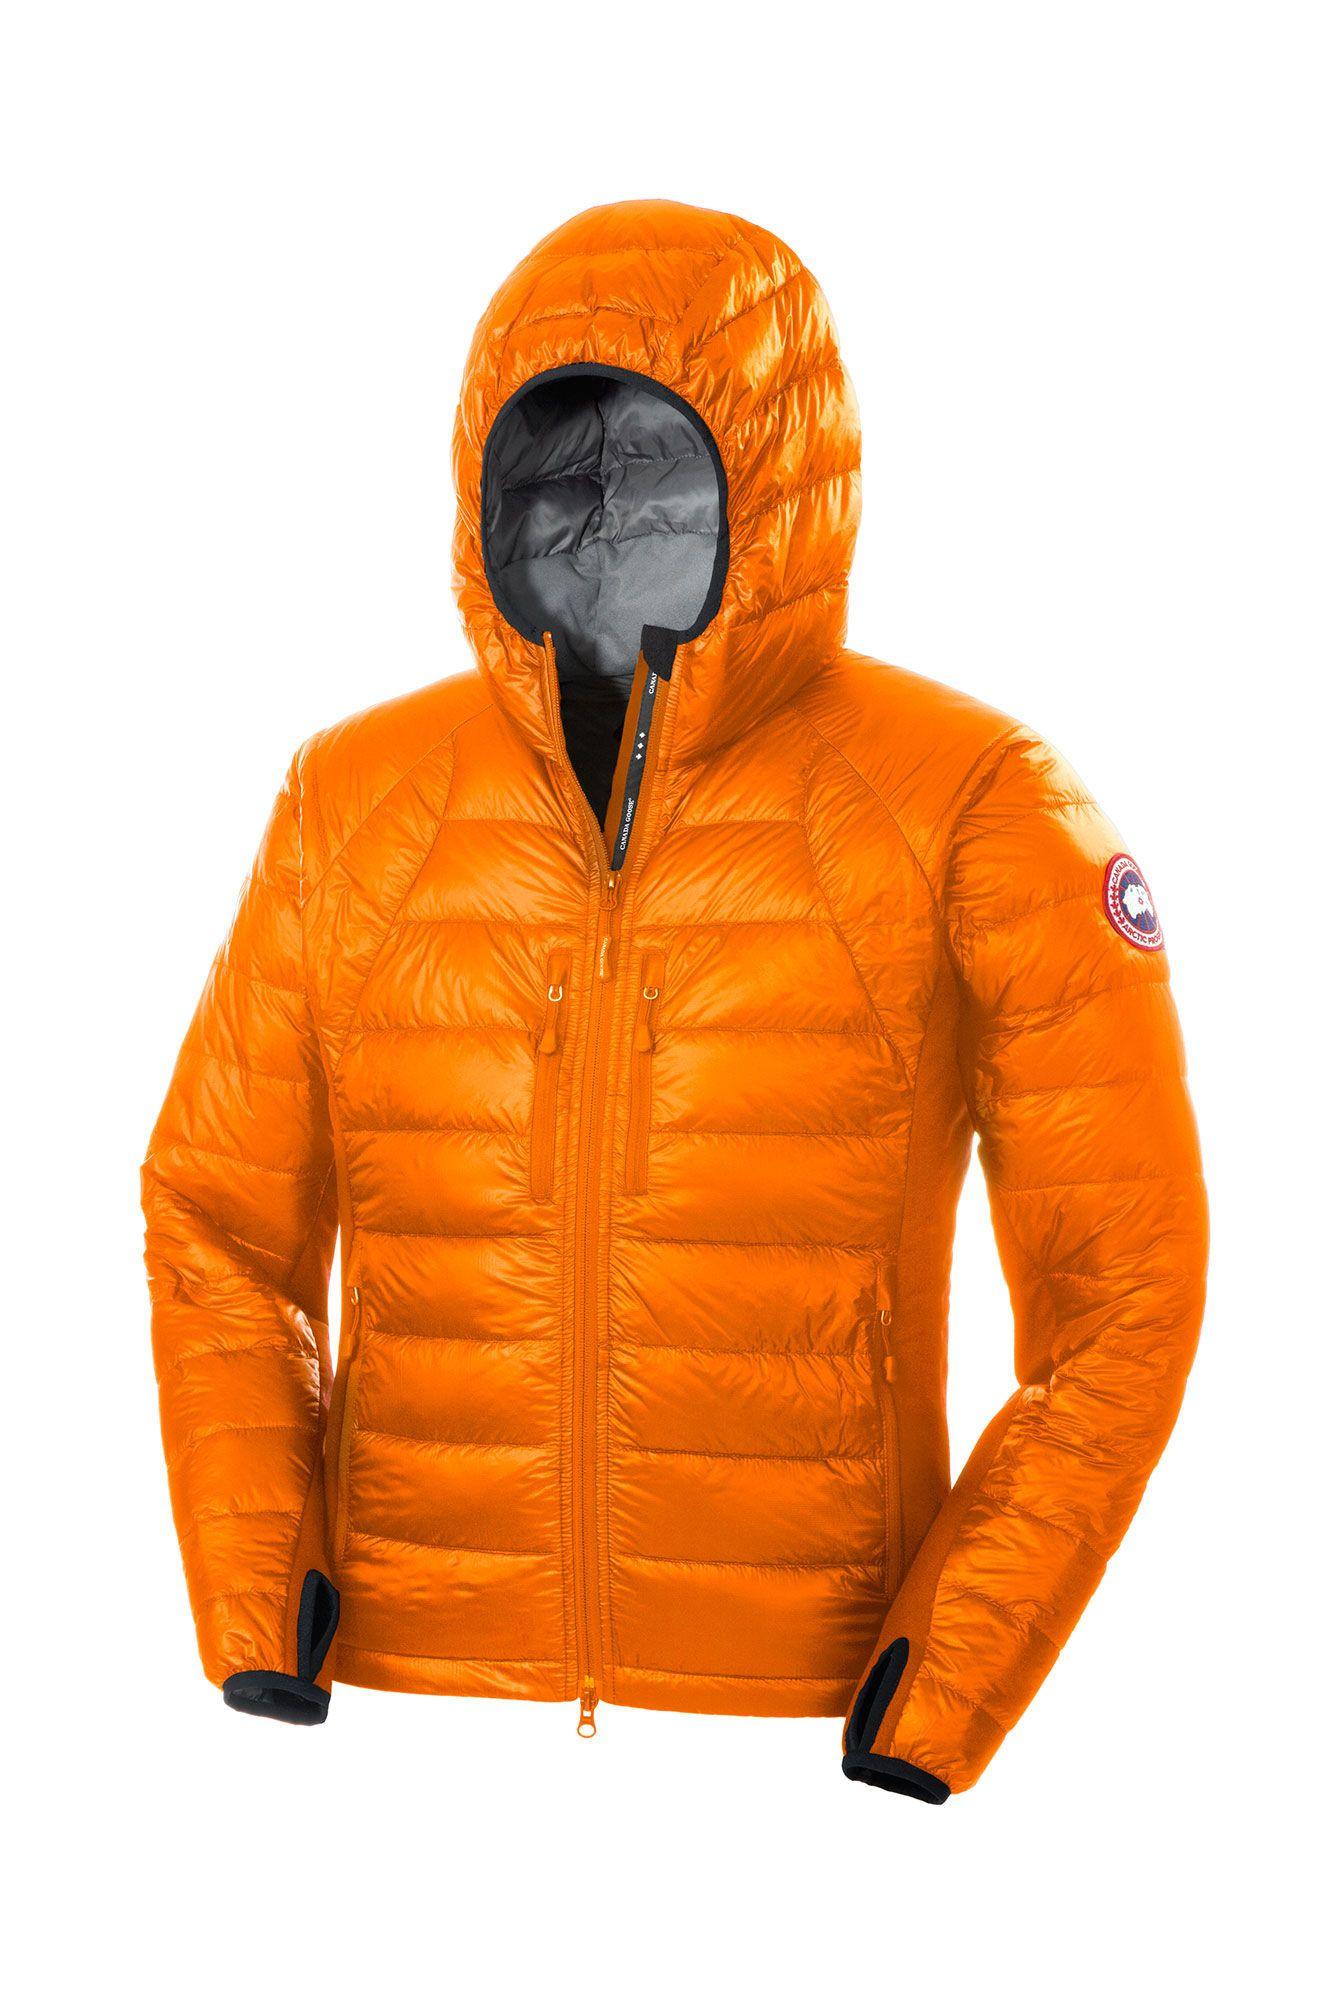 Canadagoose coatswinter coats